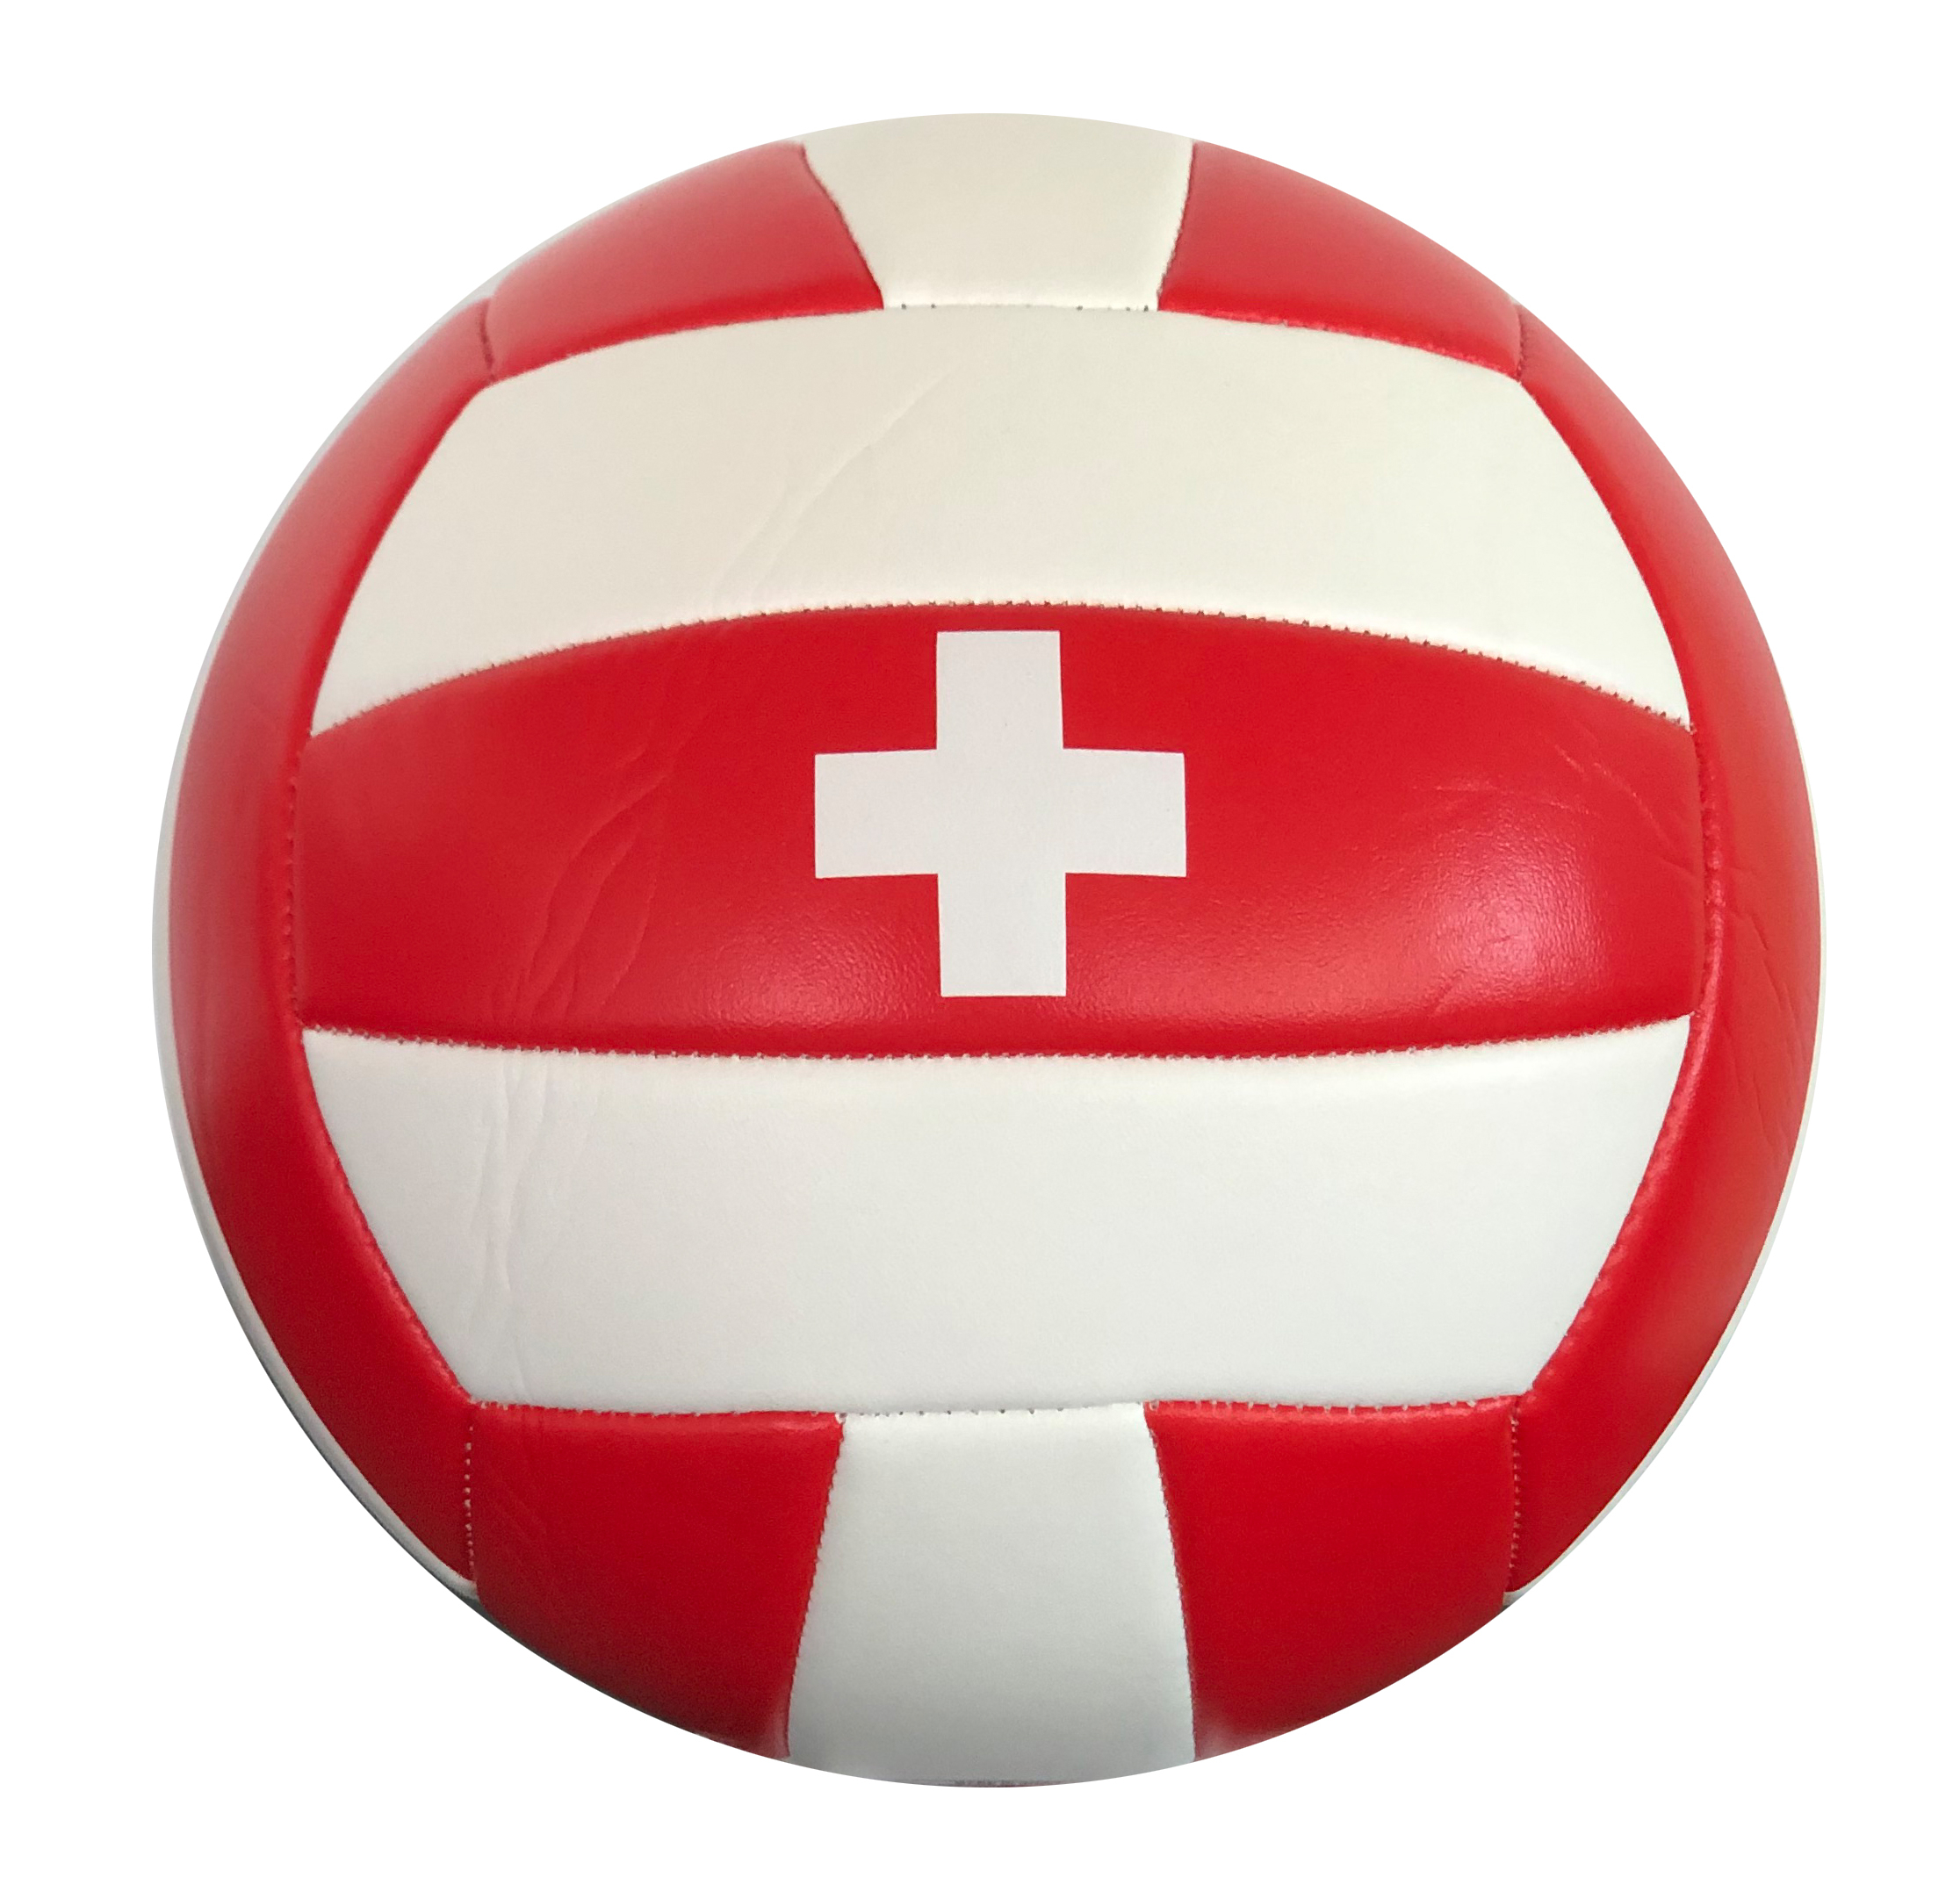 DIVERSE Volleyball Set Suisse